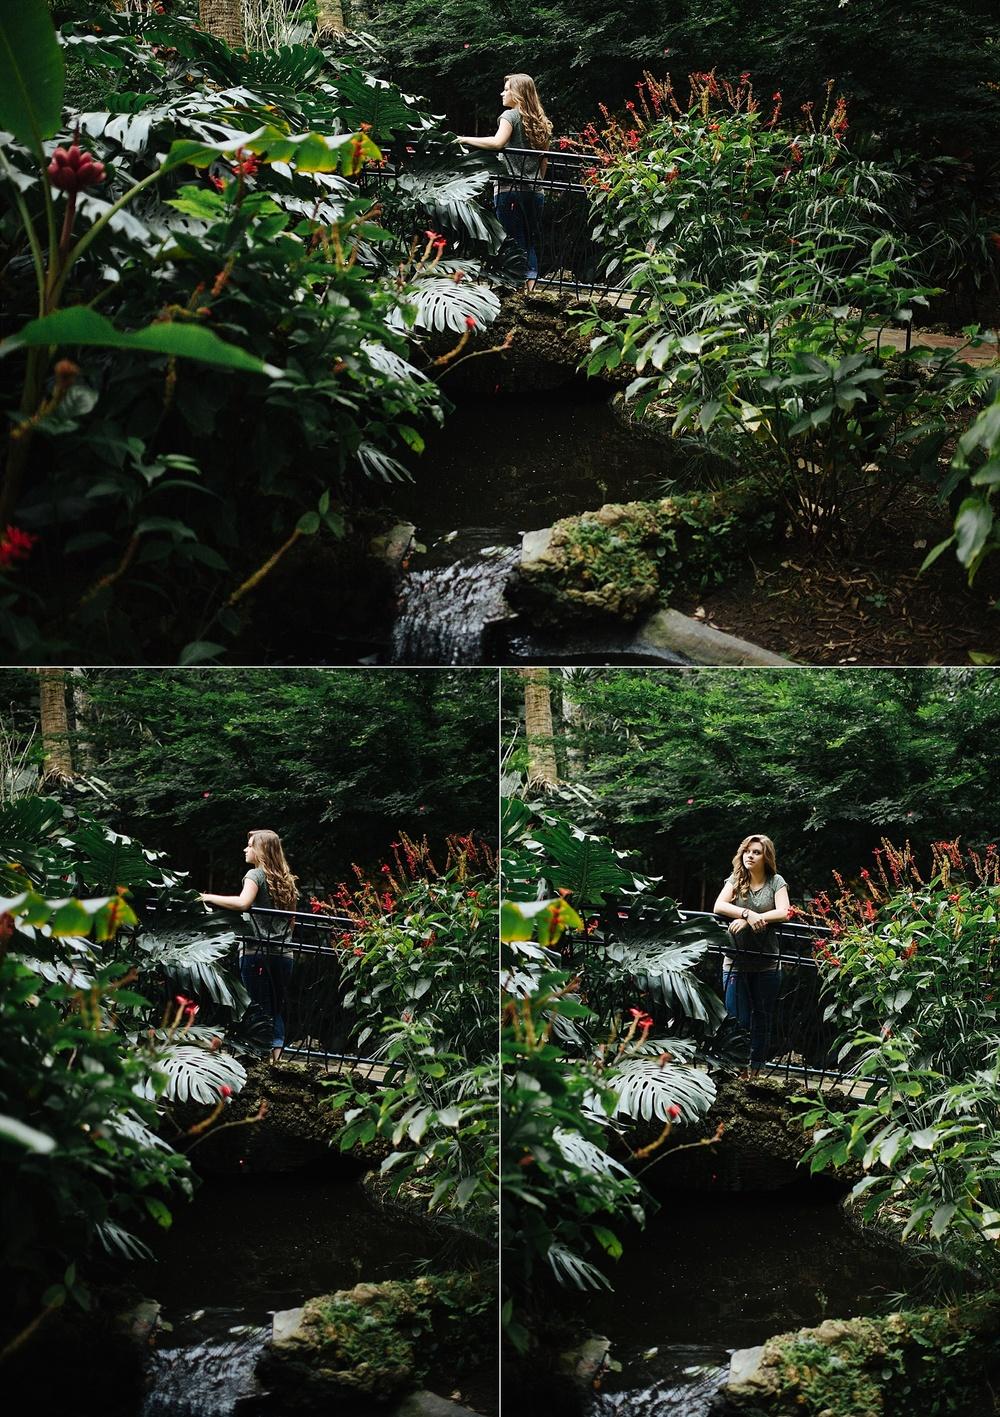 stpete senior portraits sunken gardens leah-6